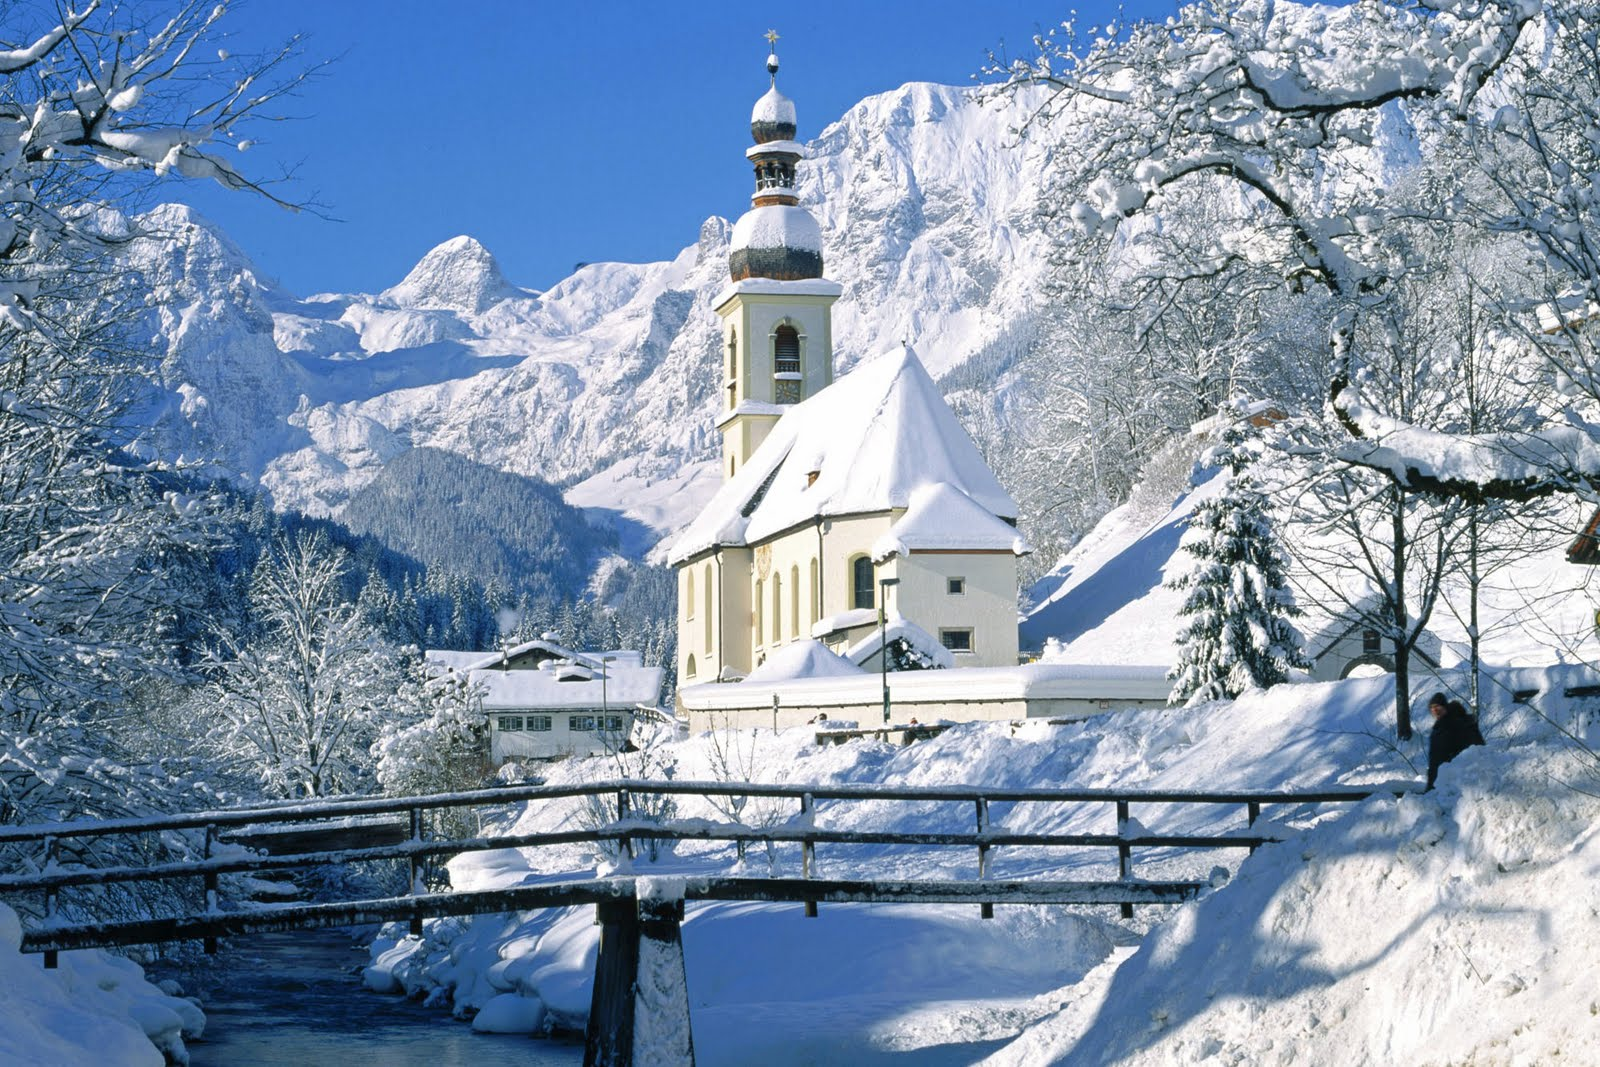 scenic winter beautiful wallpapers - photo #36